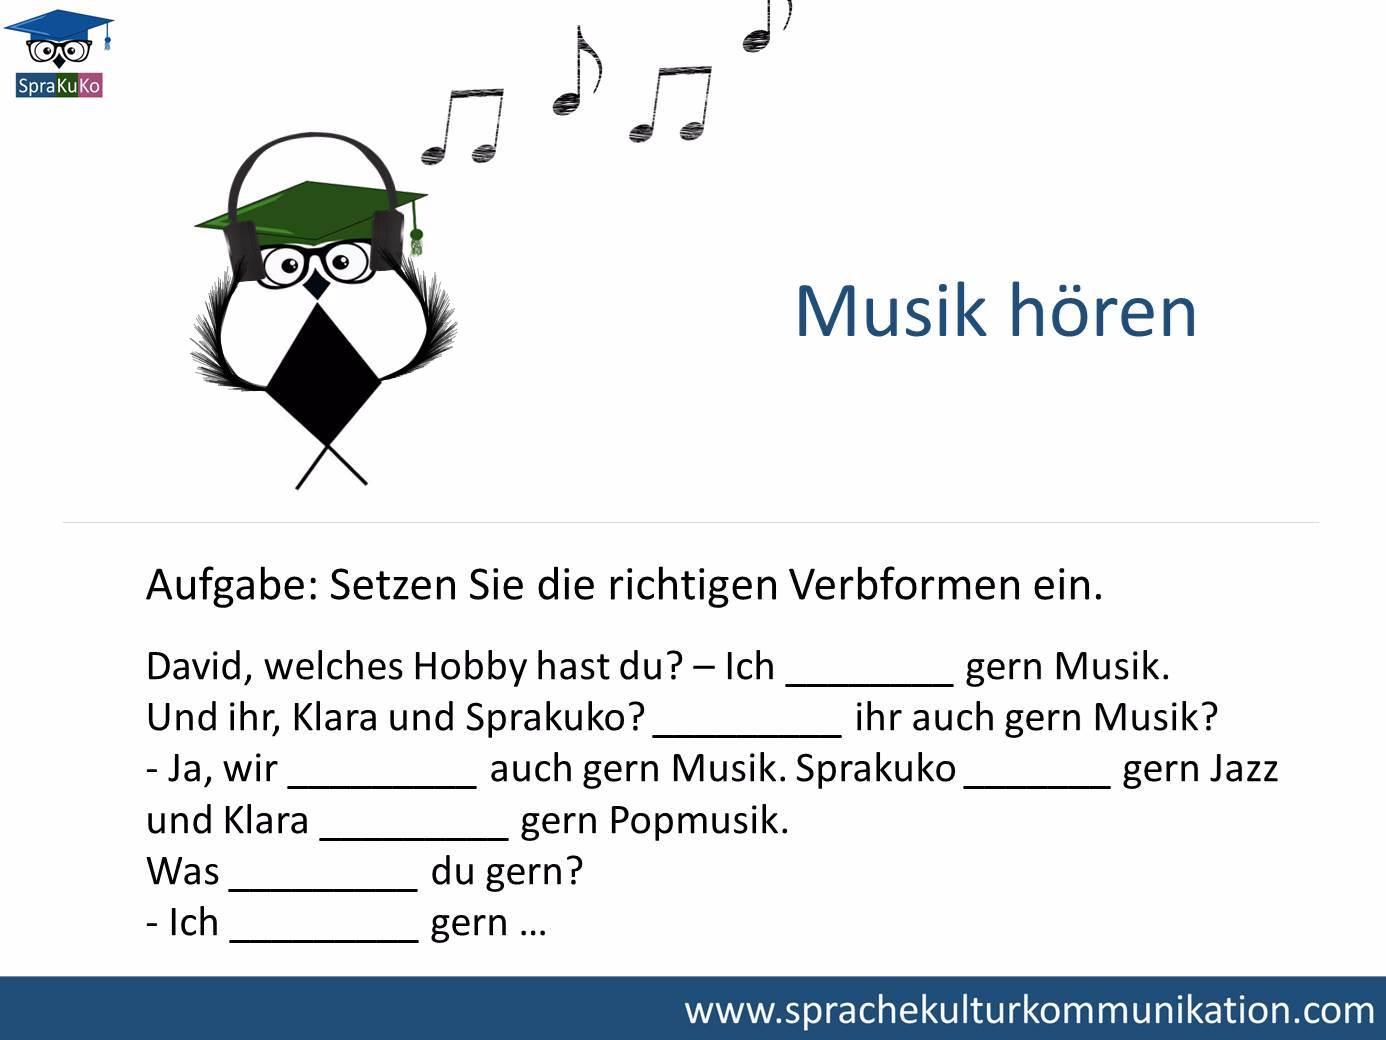 Verb Musik hören